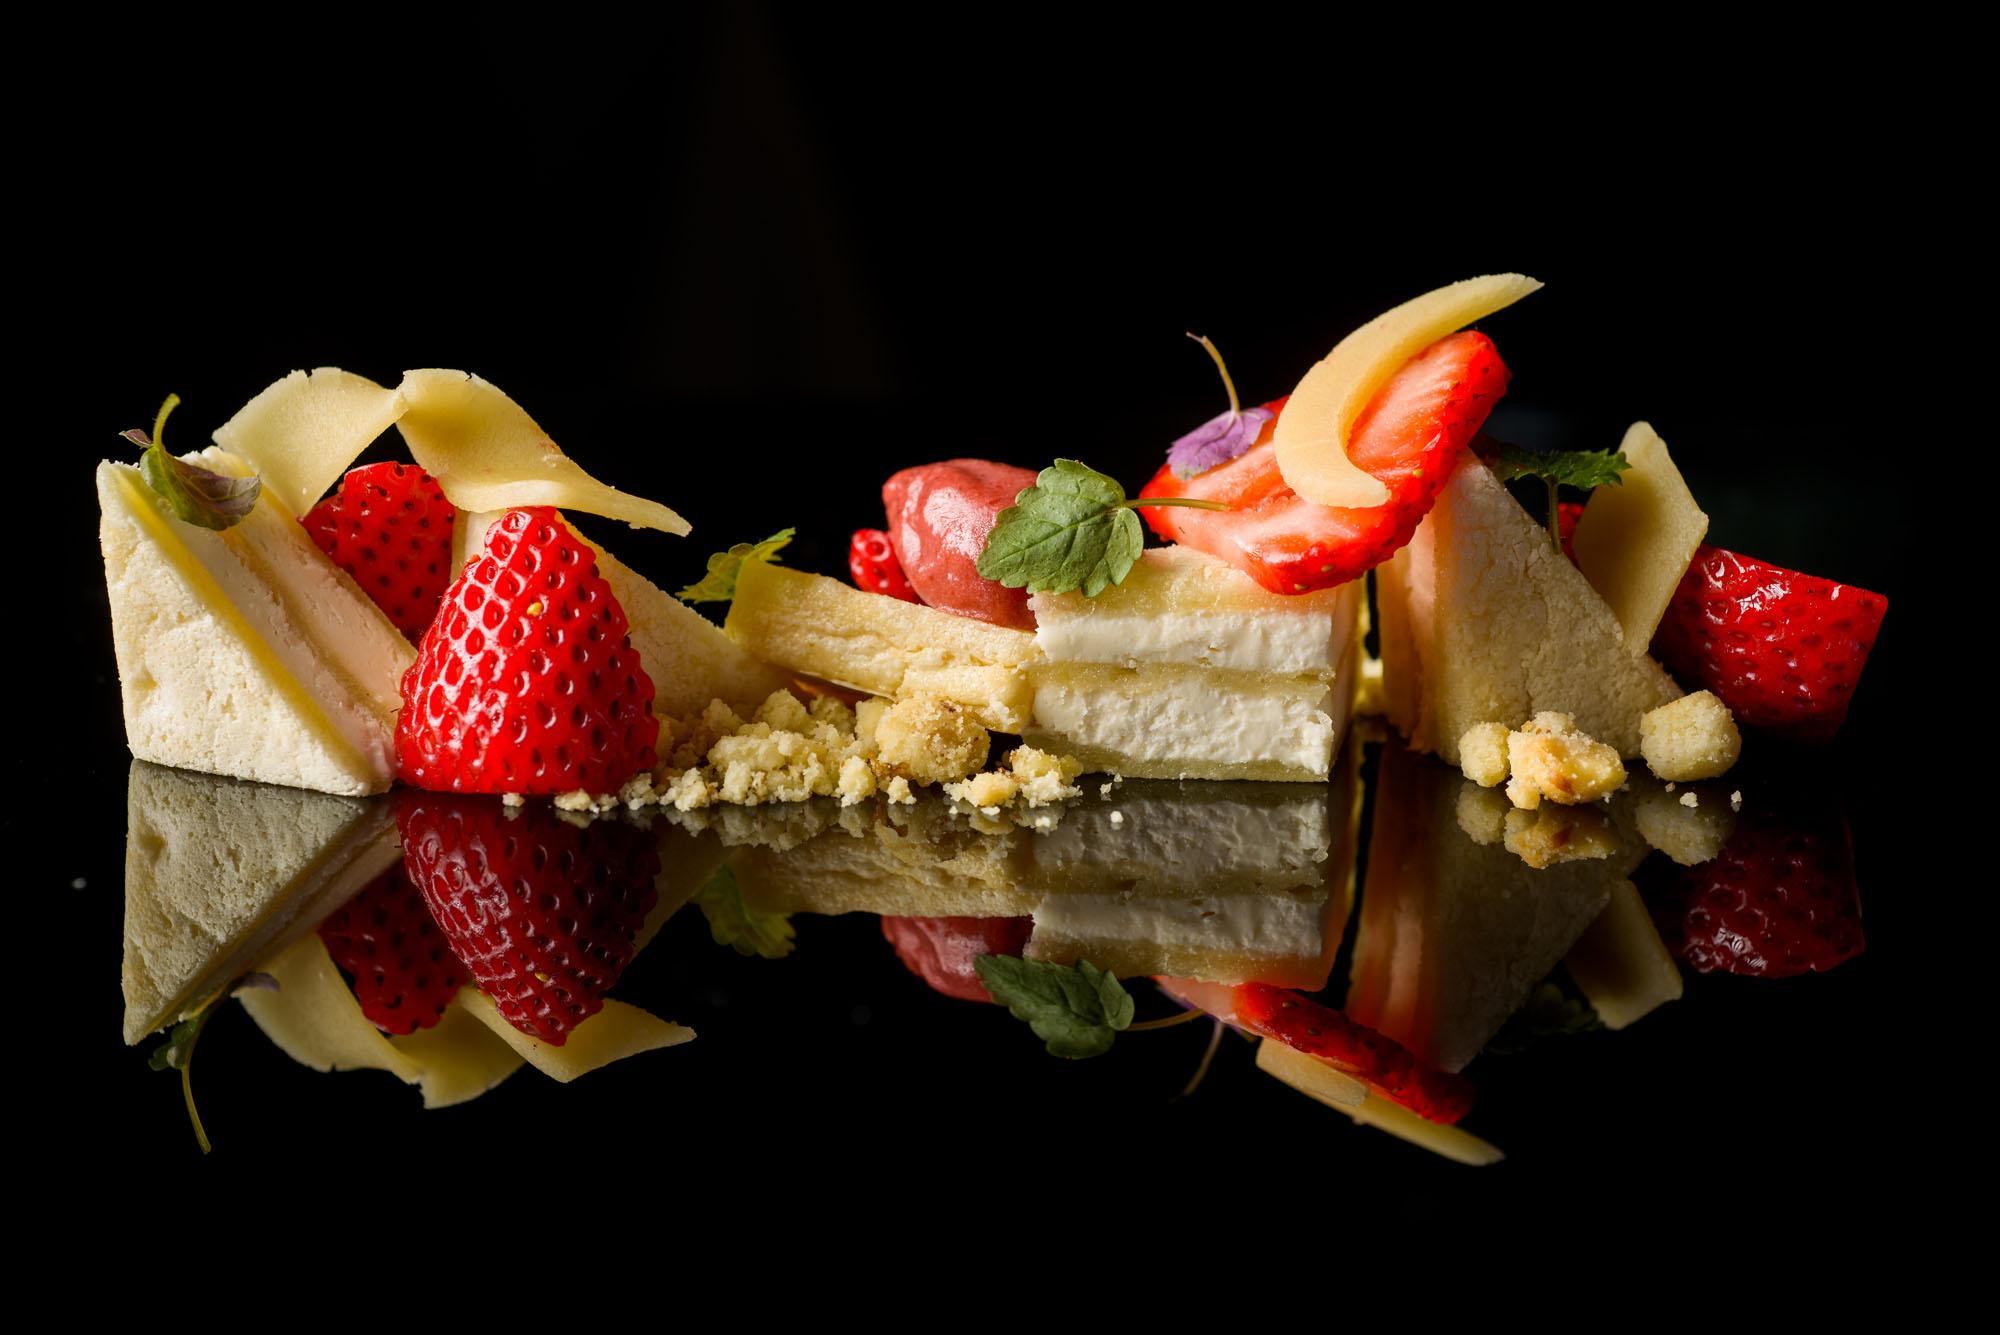 7520_d800b_Le_Papillon_San_Jose_Food_Photography.jpg